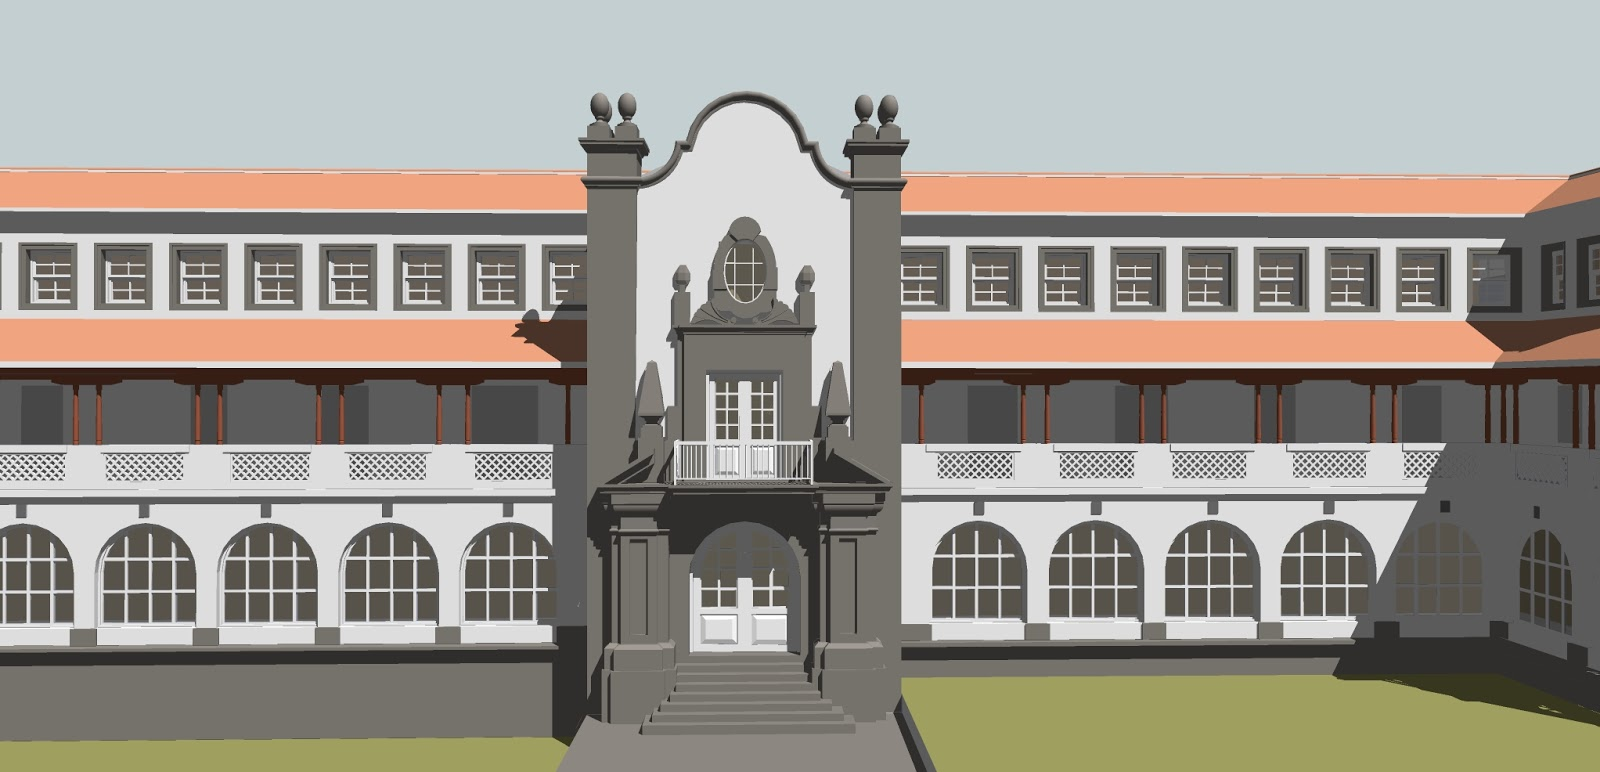 Arquitectura hist rica en tenerife espa a colegio mayor - Colegio aparejadores tenerife ...